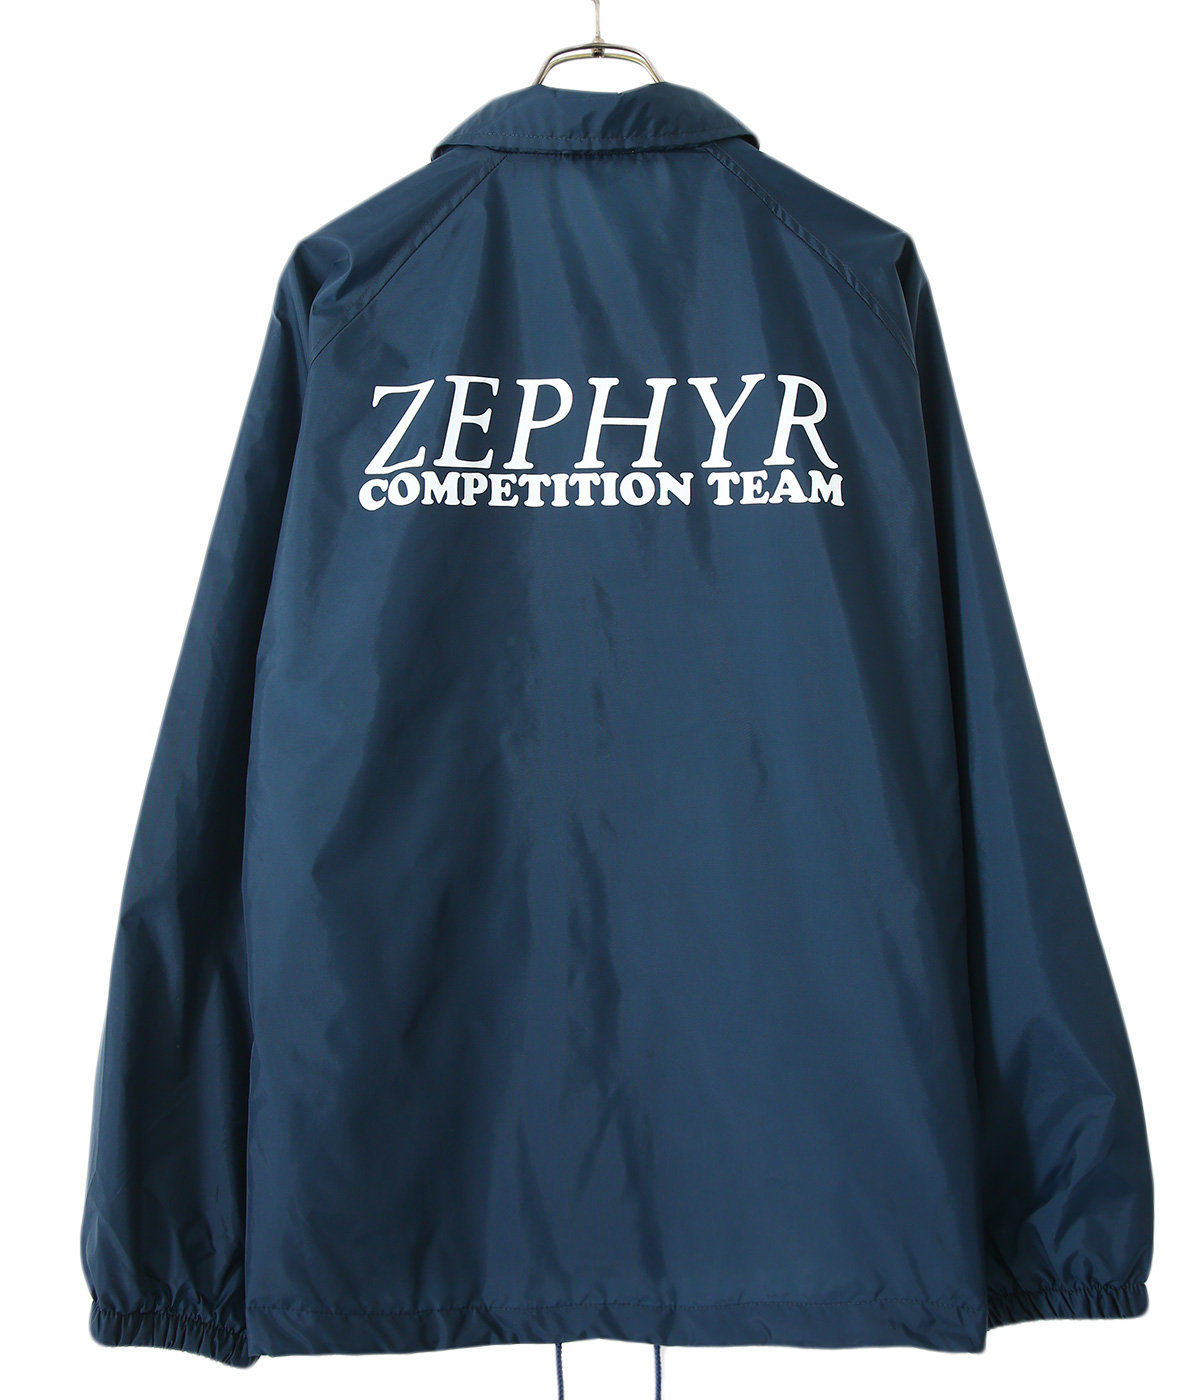 ZEPHER Coach Jacket